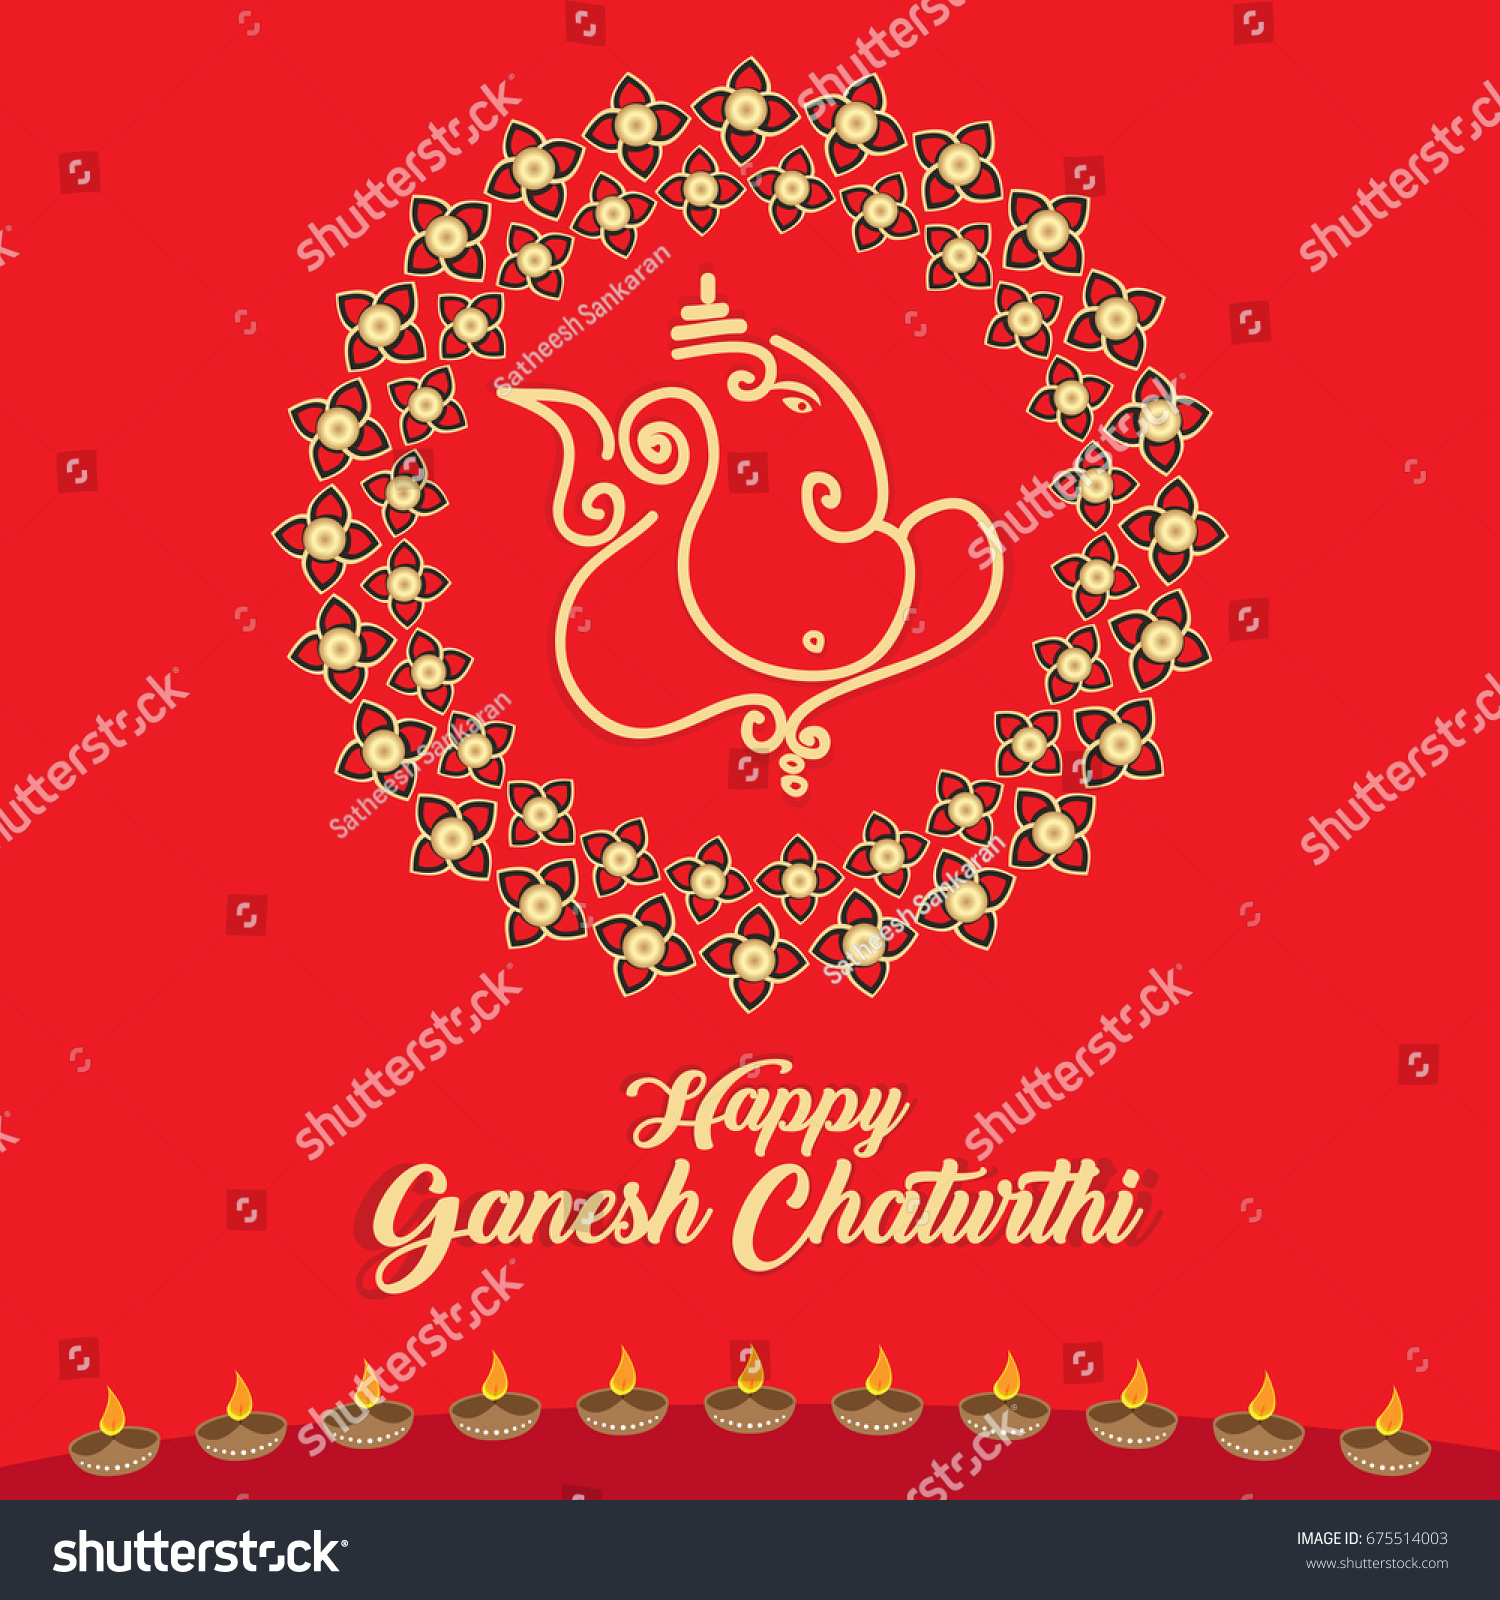 Happy Ganesh Chaturthi Greeting Card Vector Stock Vector Royalty